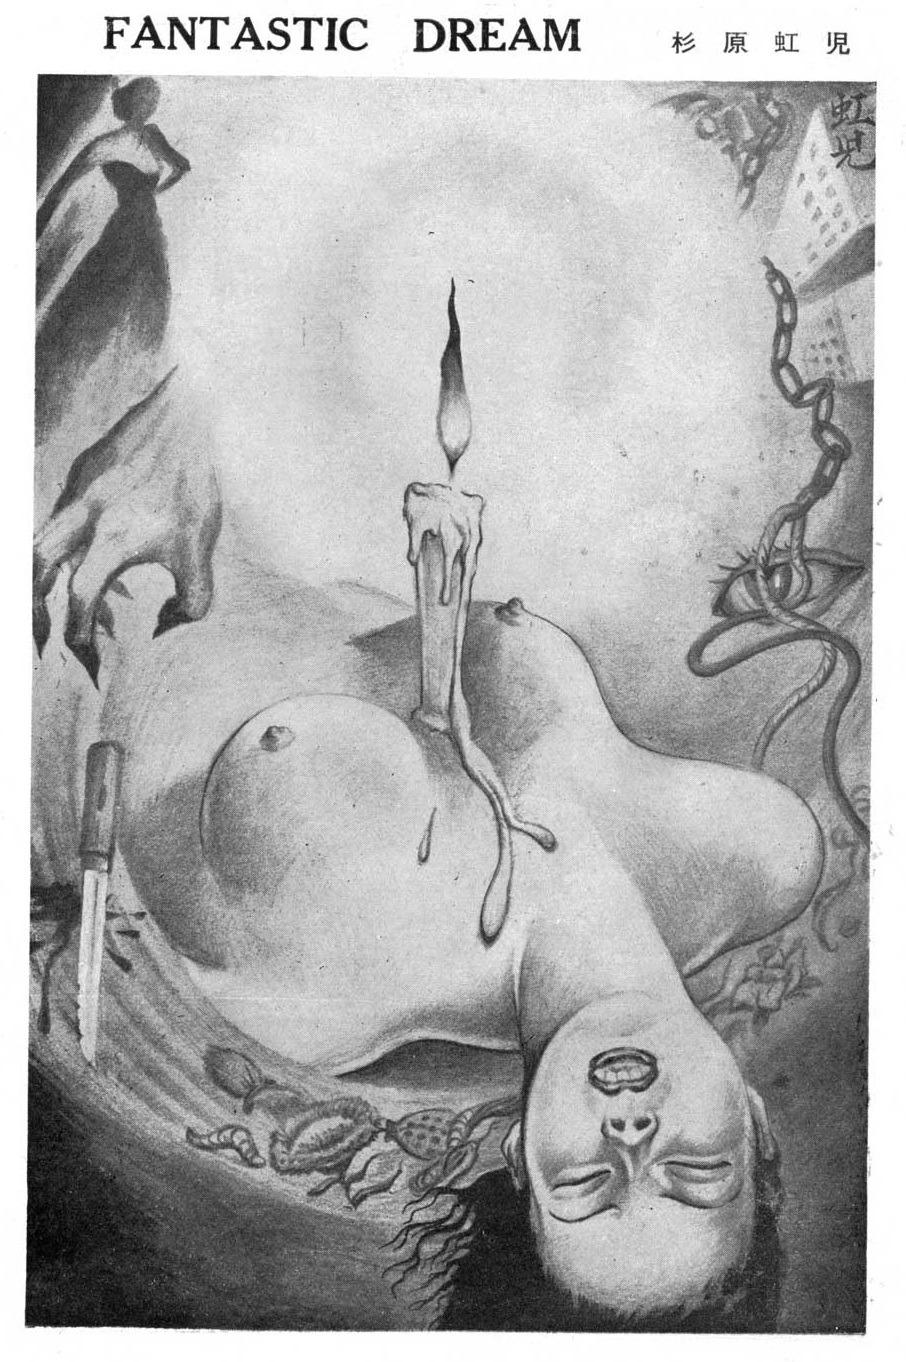 mirrormaskcamera: (via Les Rétro-Galeries de Mr Gutsy: Kitan Club, années 50 - 3 - Dessins pleine page)